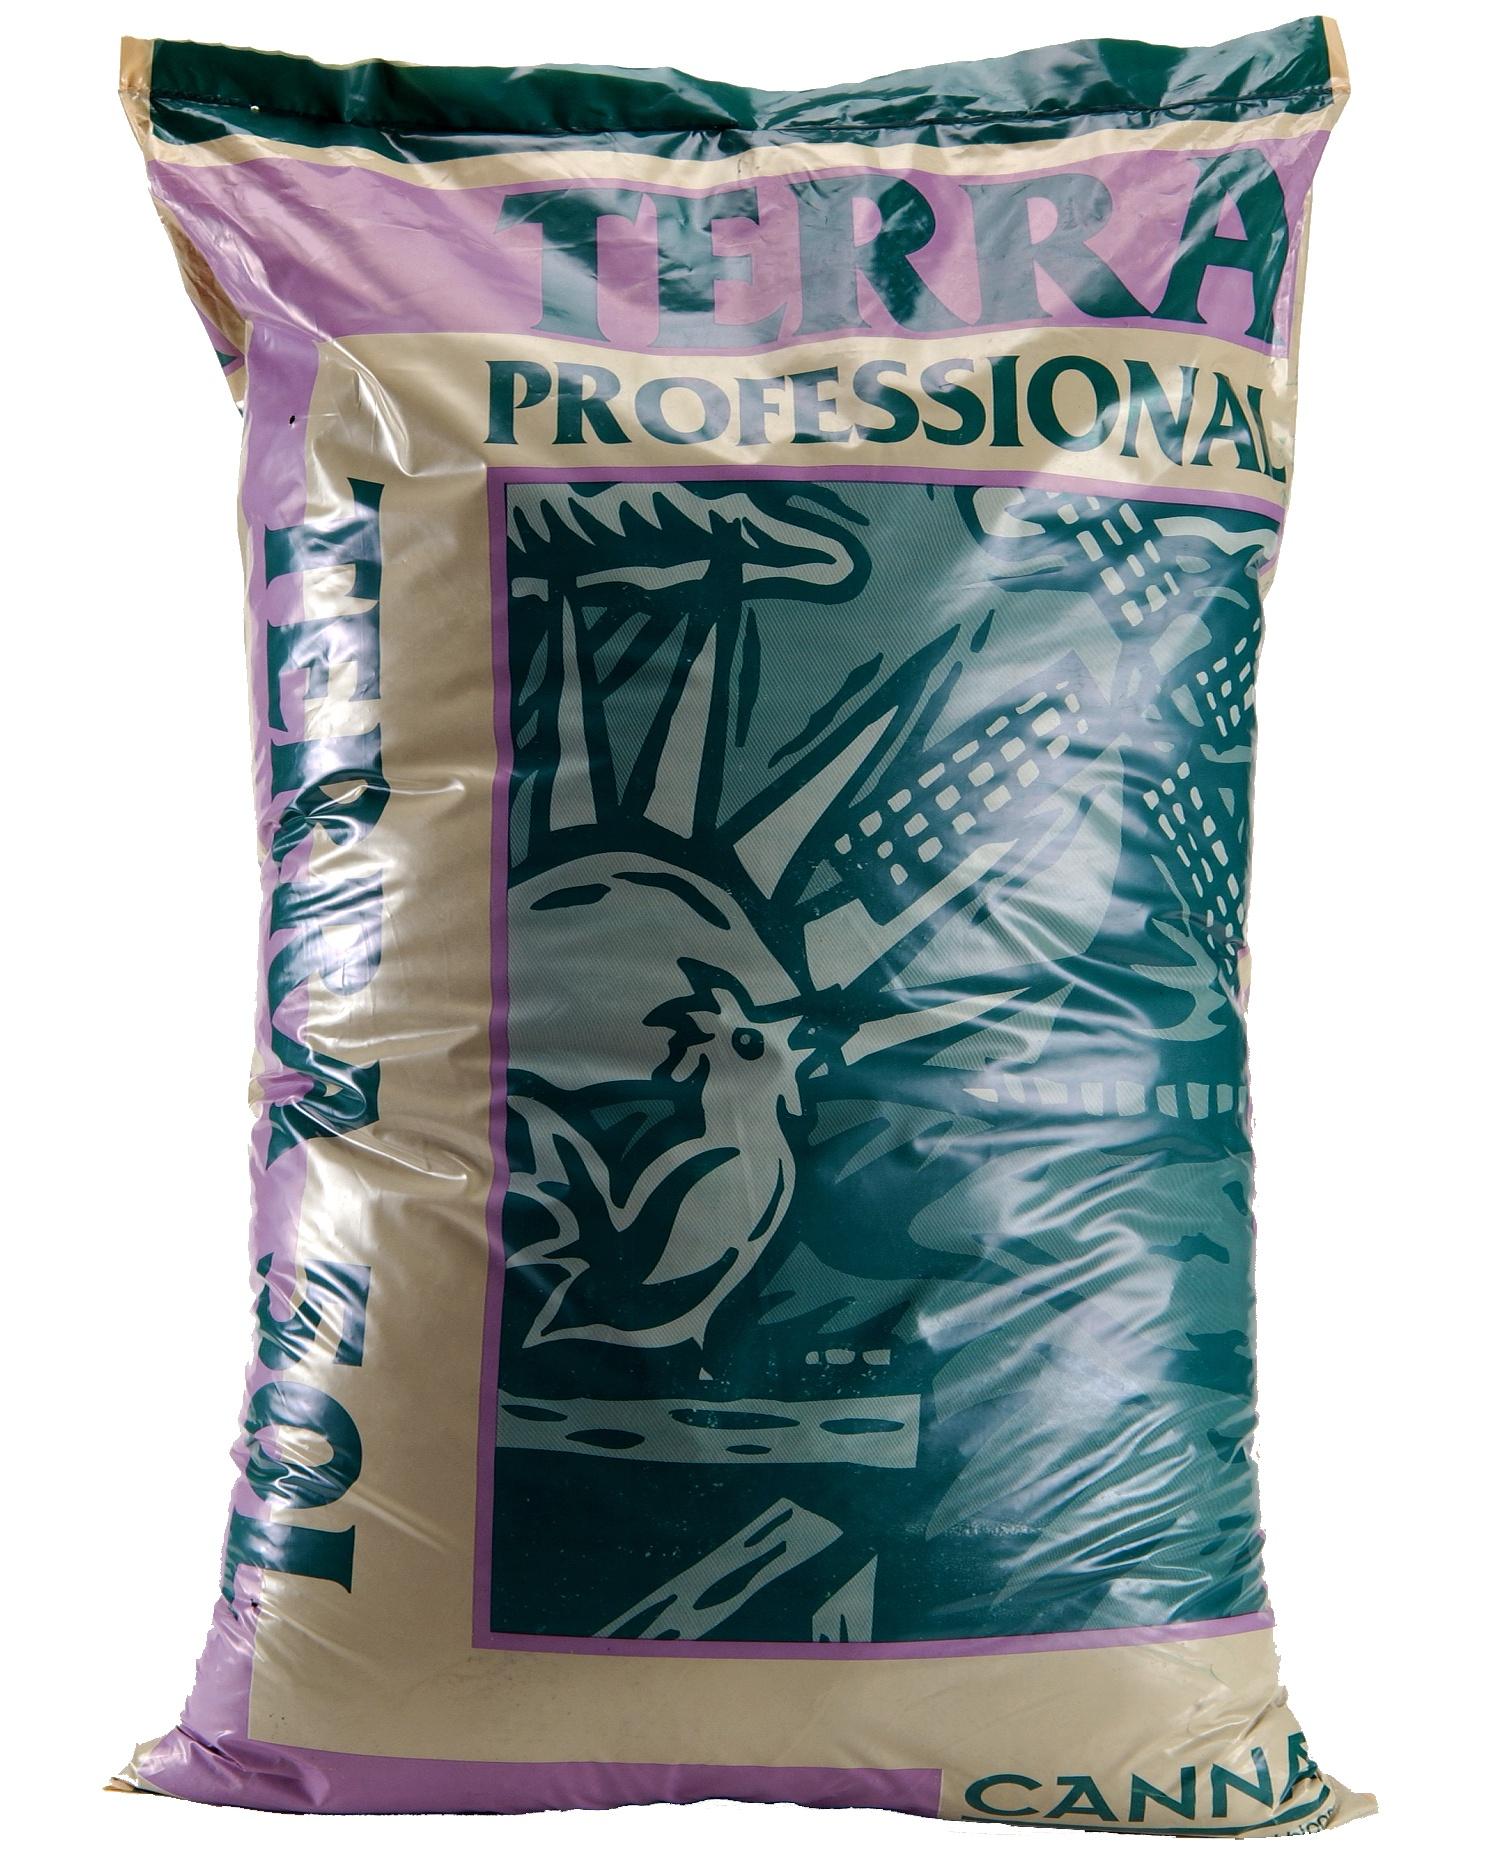 terra-professional-50l-canna